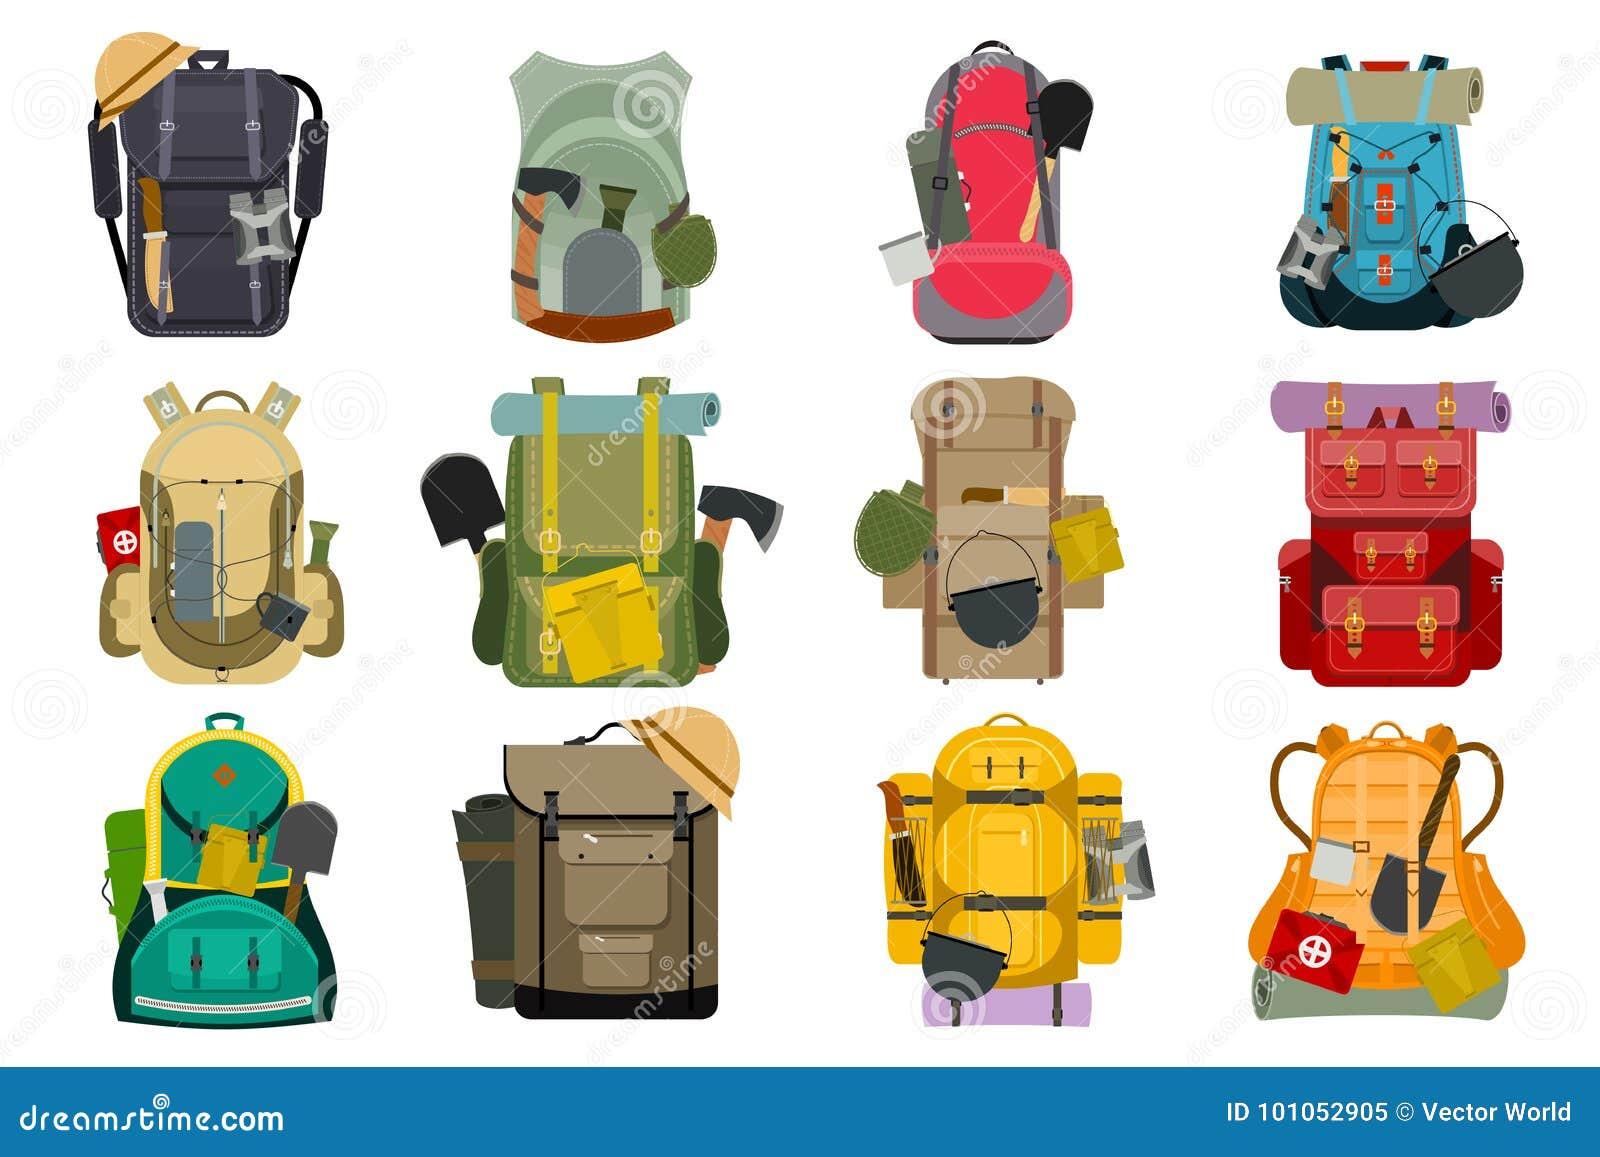 a55bfdd249 Backpack rucksack travel tourist knapsack outdoor hiking traveler backpacker  baggage luggage vector illustration.